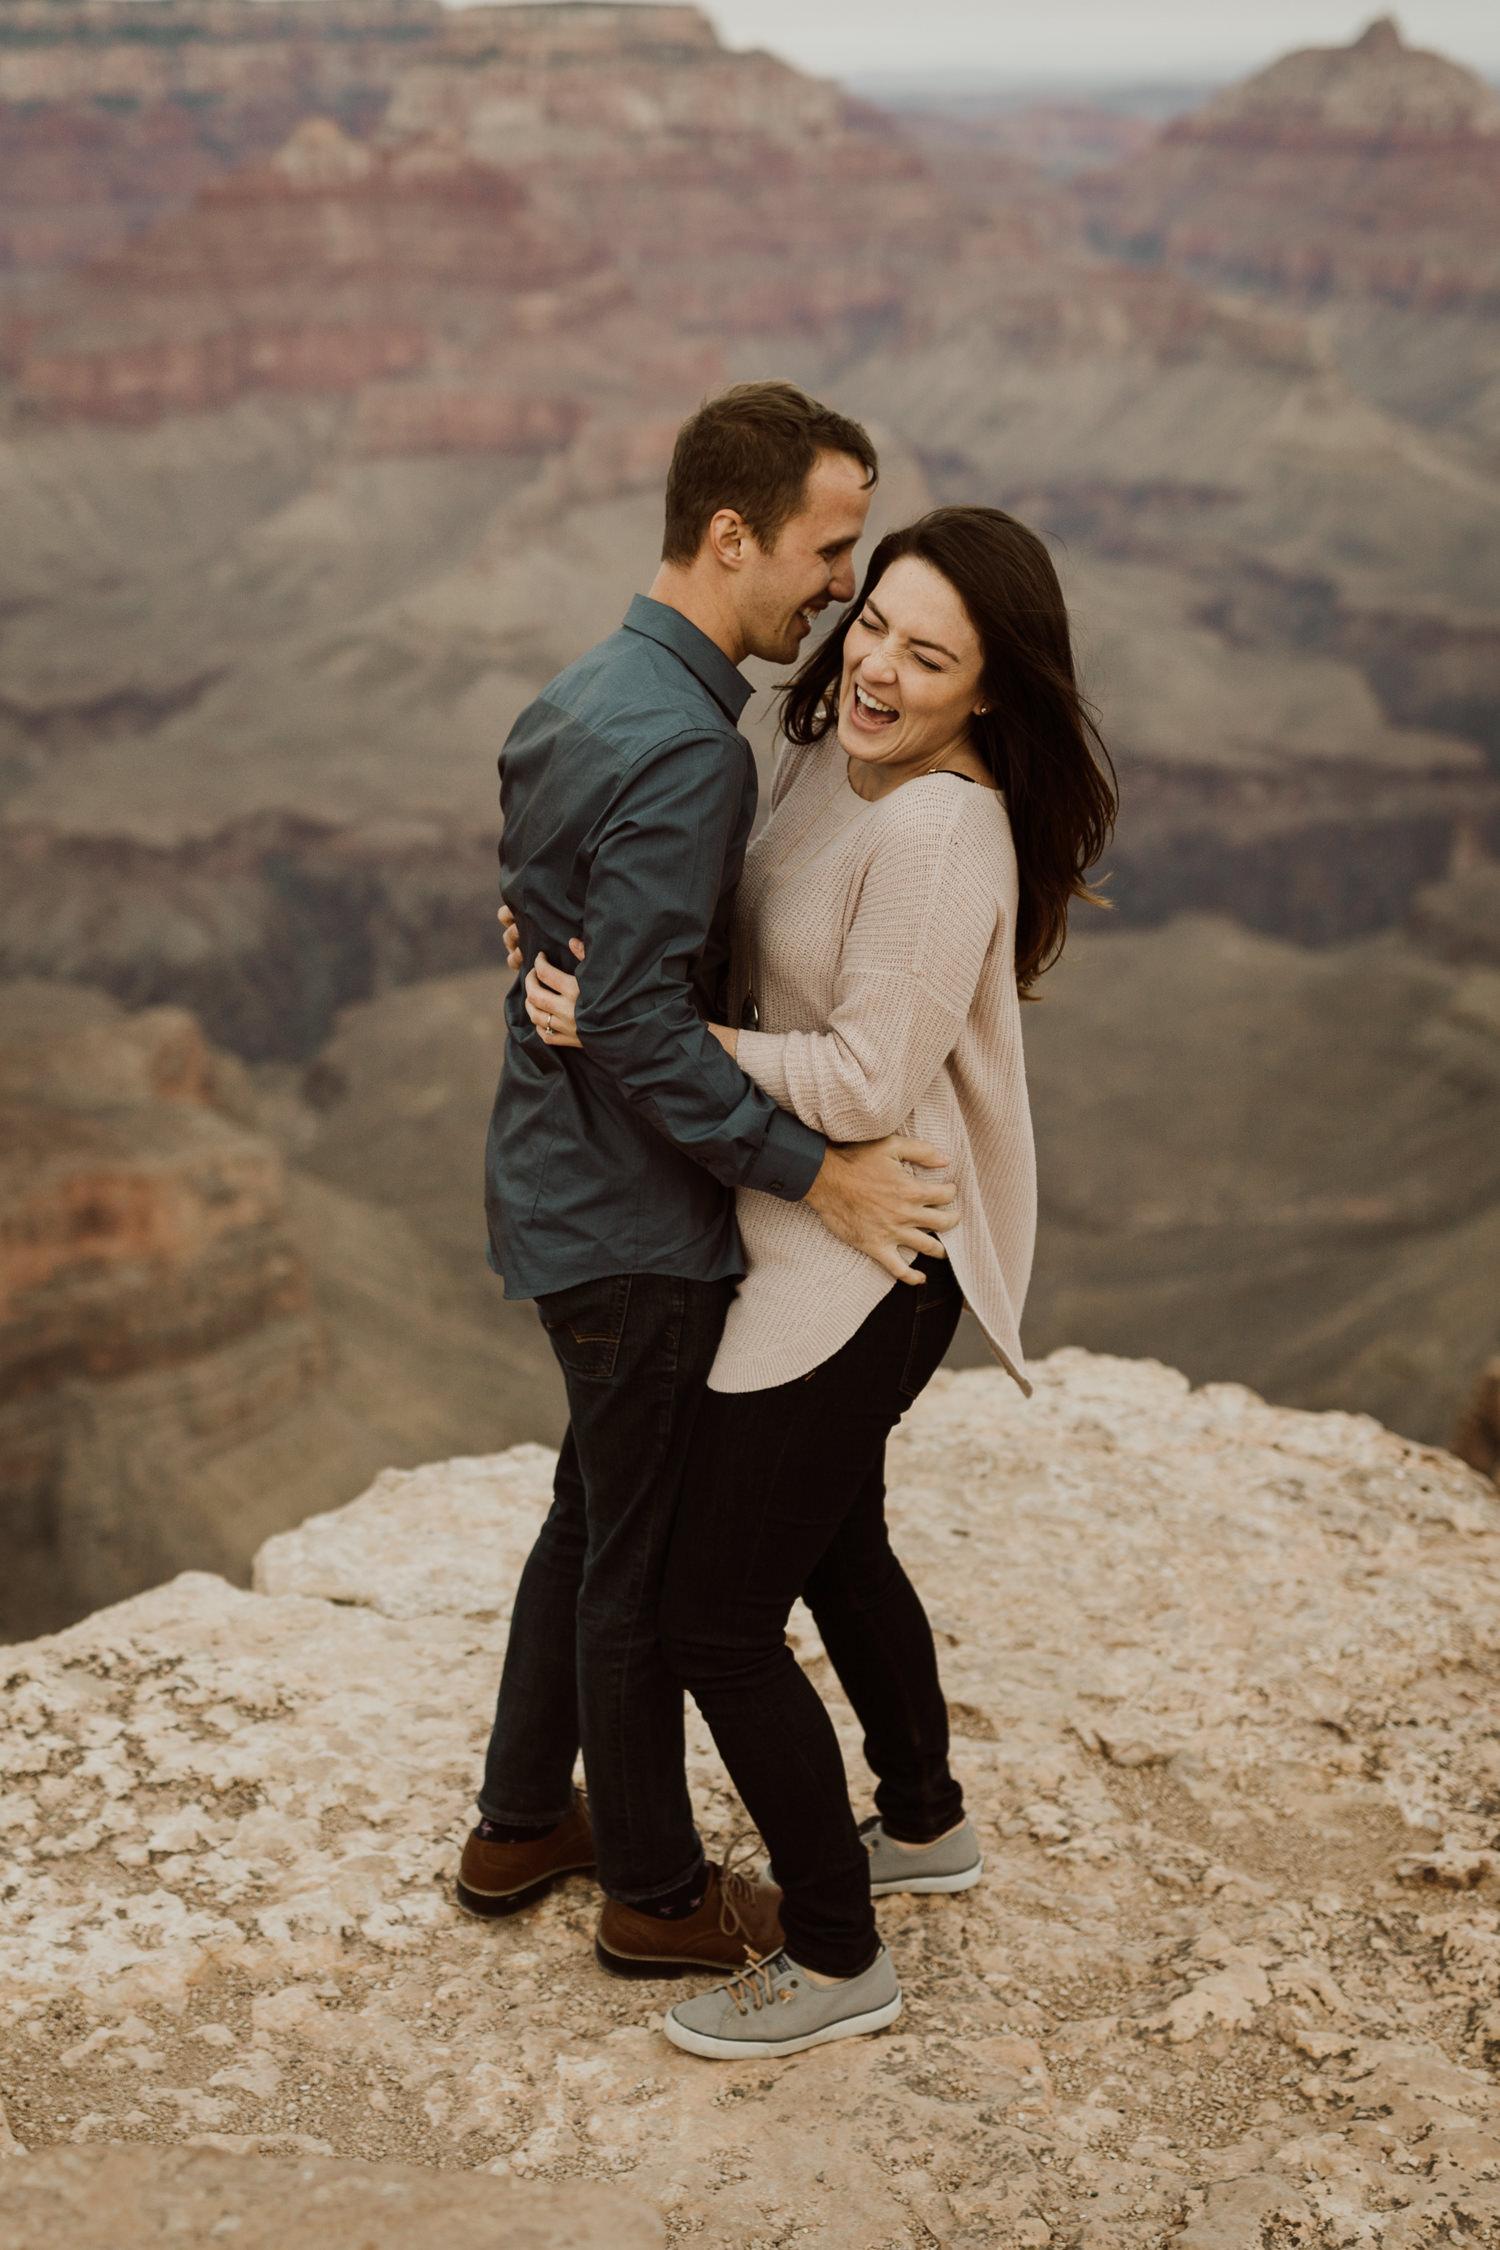 grand-canyon-national-park-engagements-6.jpg